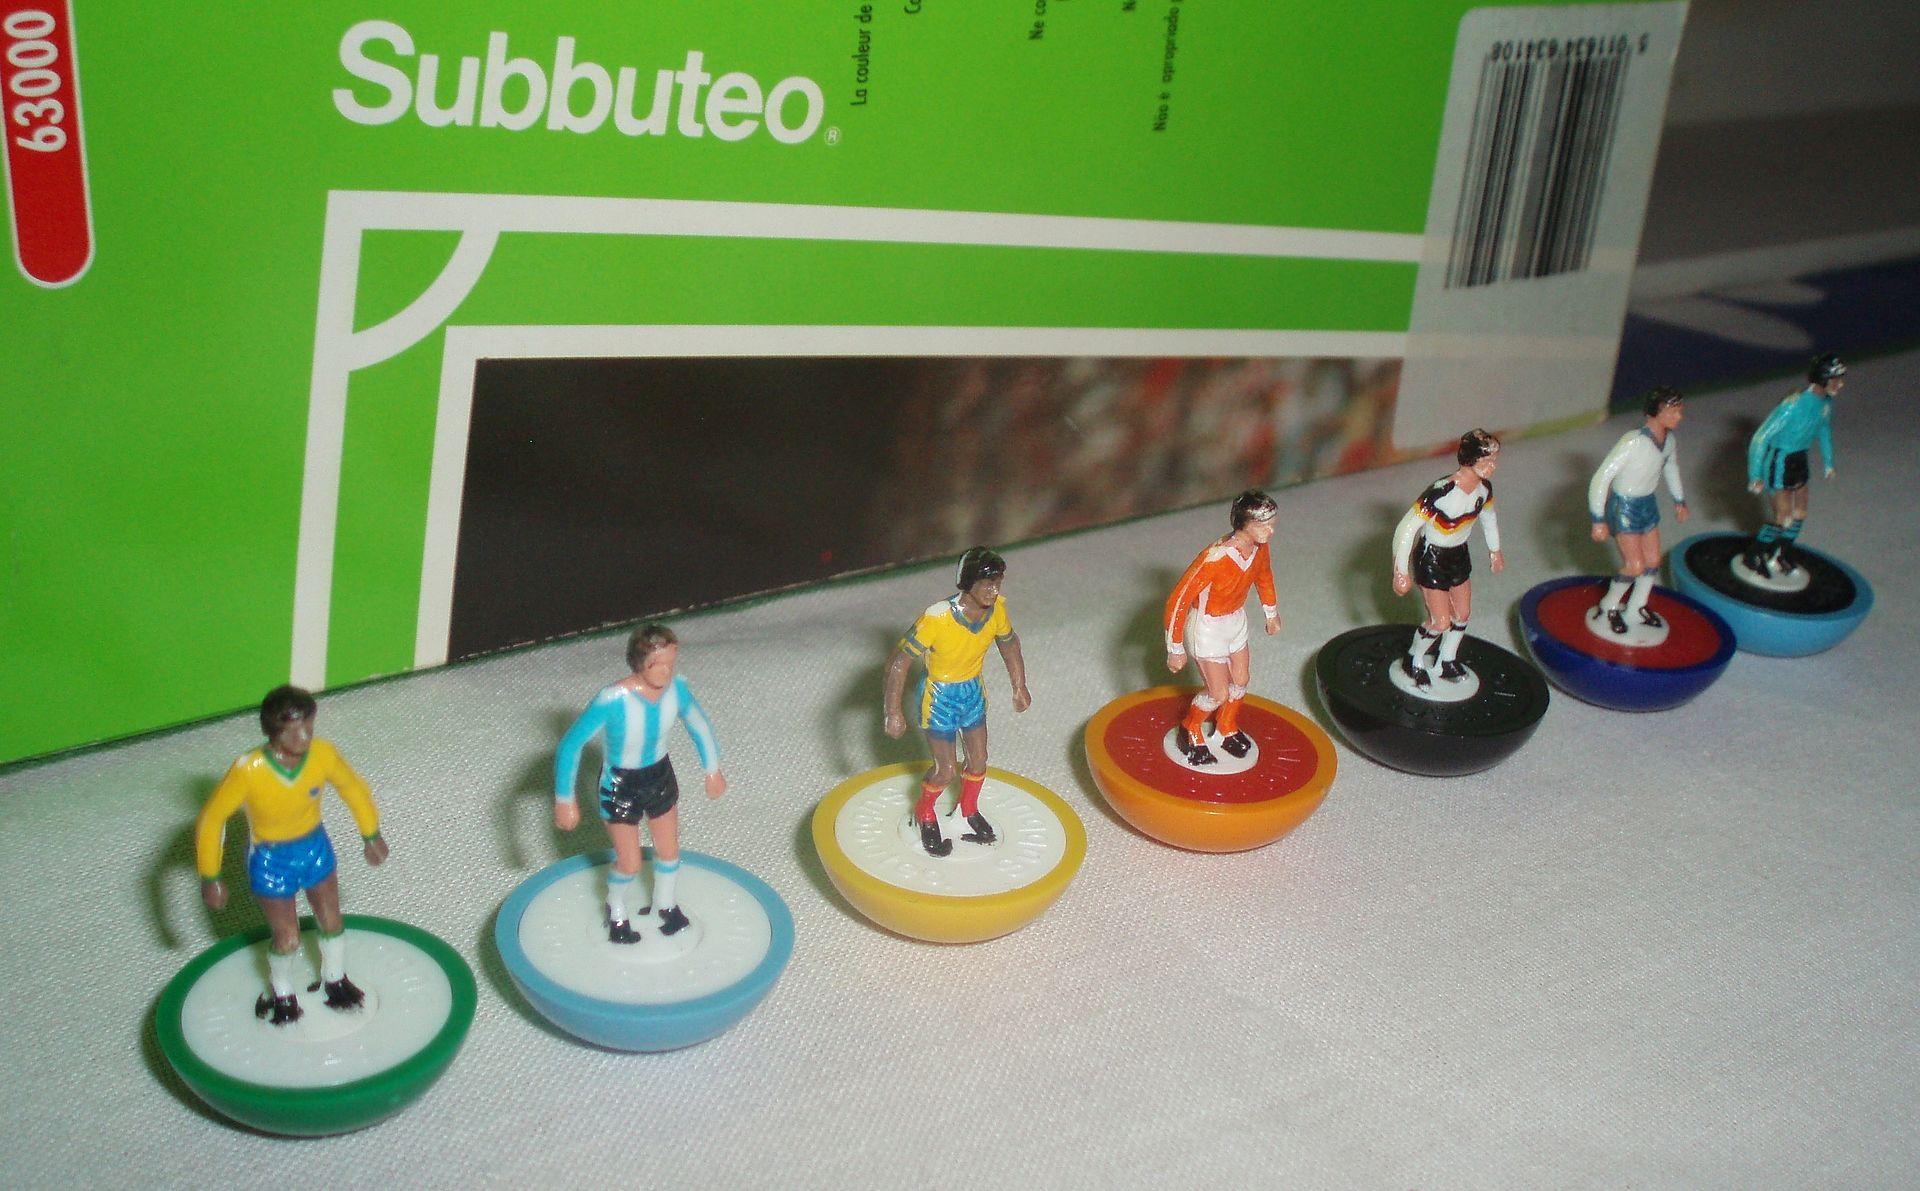 Subbuteo playersP1010292